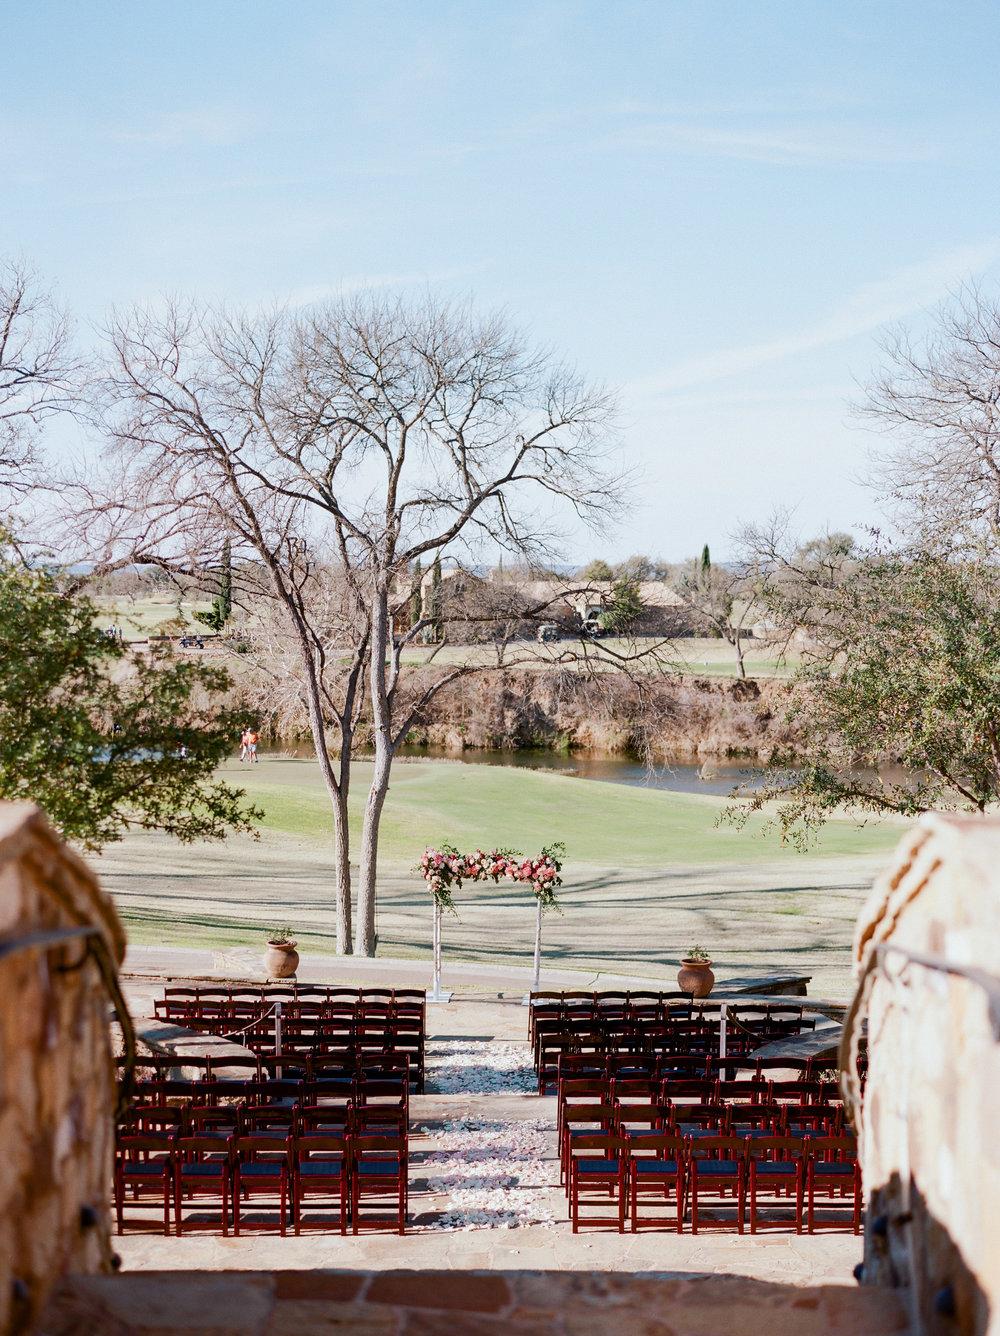 Escondido-Golf_Lake-Club-Hill-Country-Houston-Wedding-Photographer-Best-Top-Luxury-Destination-Engagements-Portrait-Austin-Photography-78.jpg